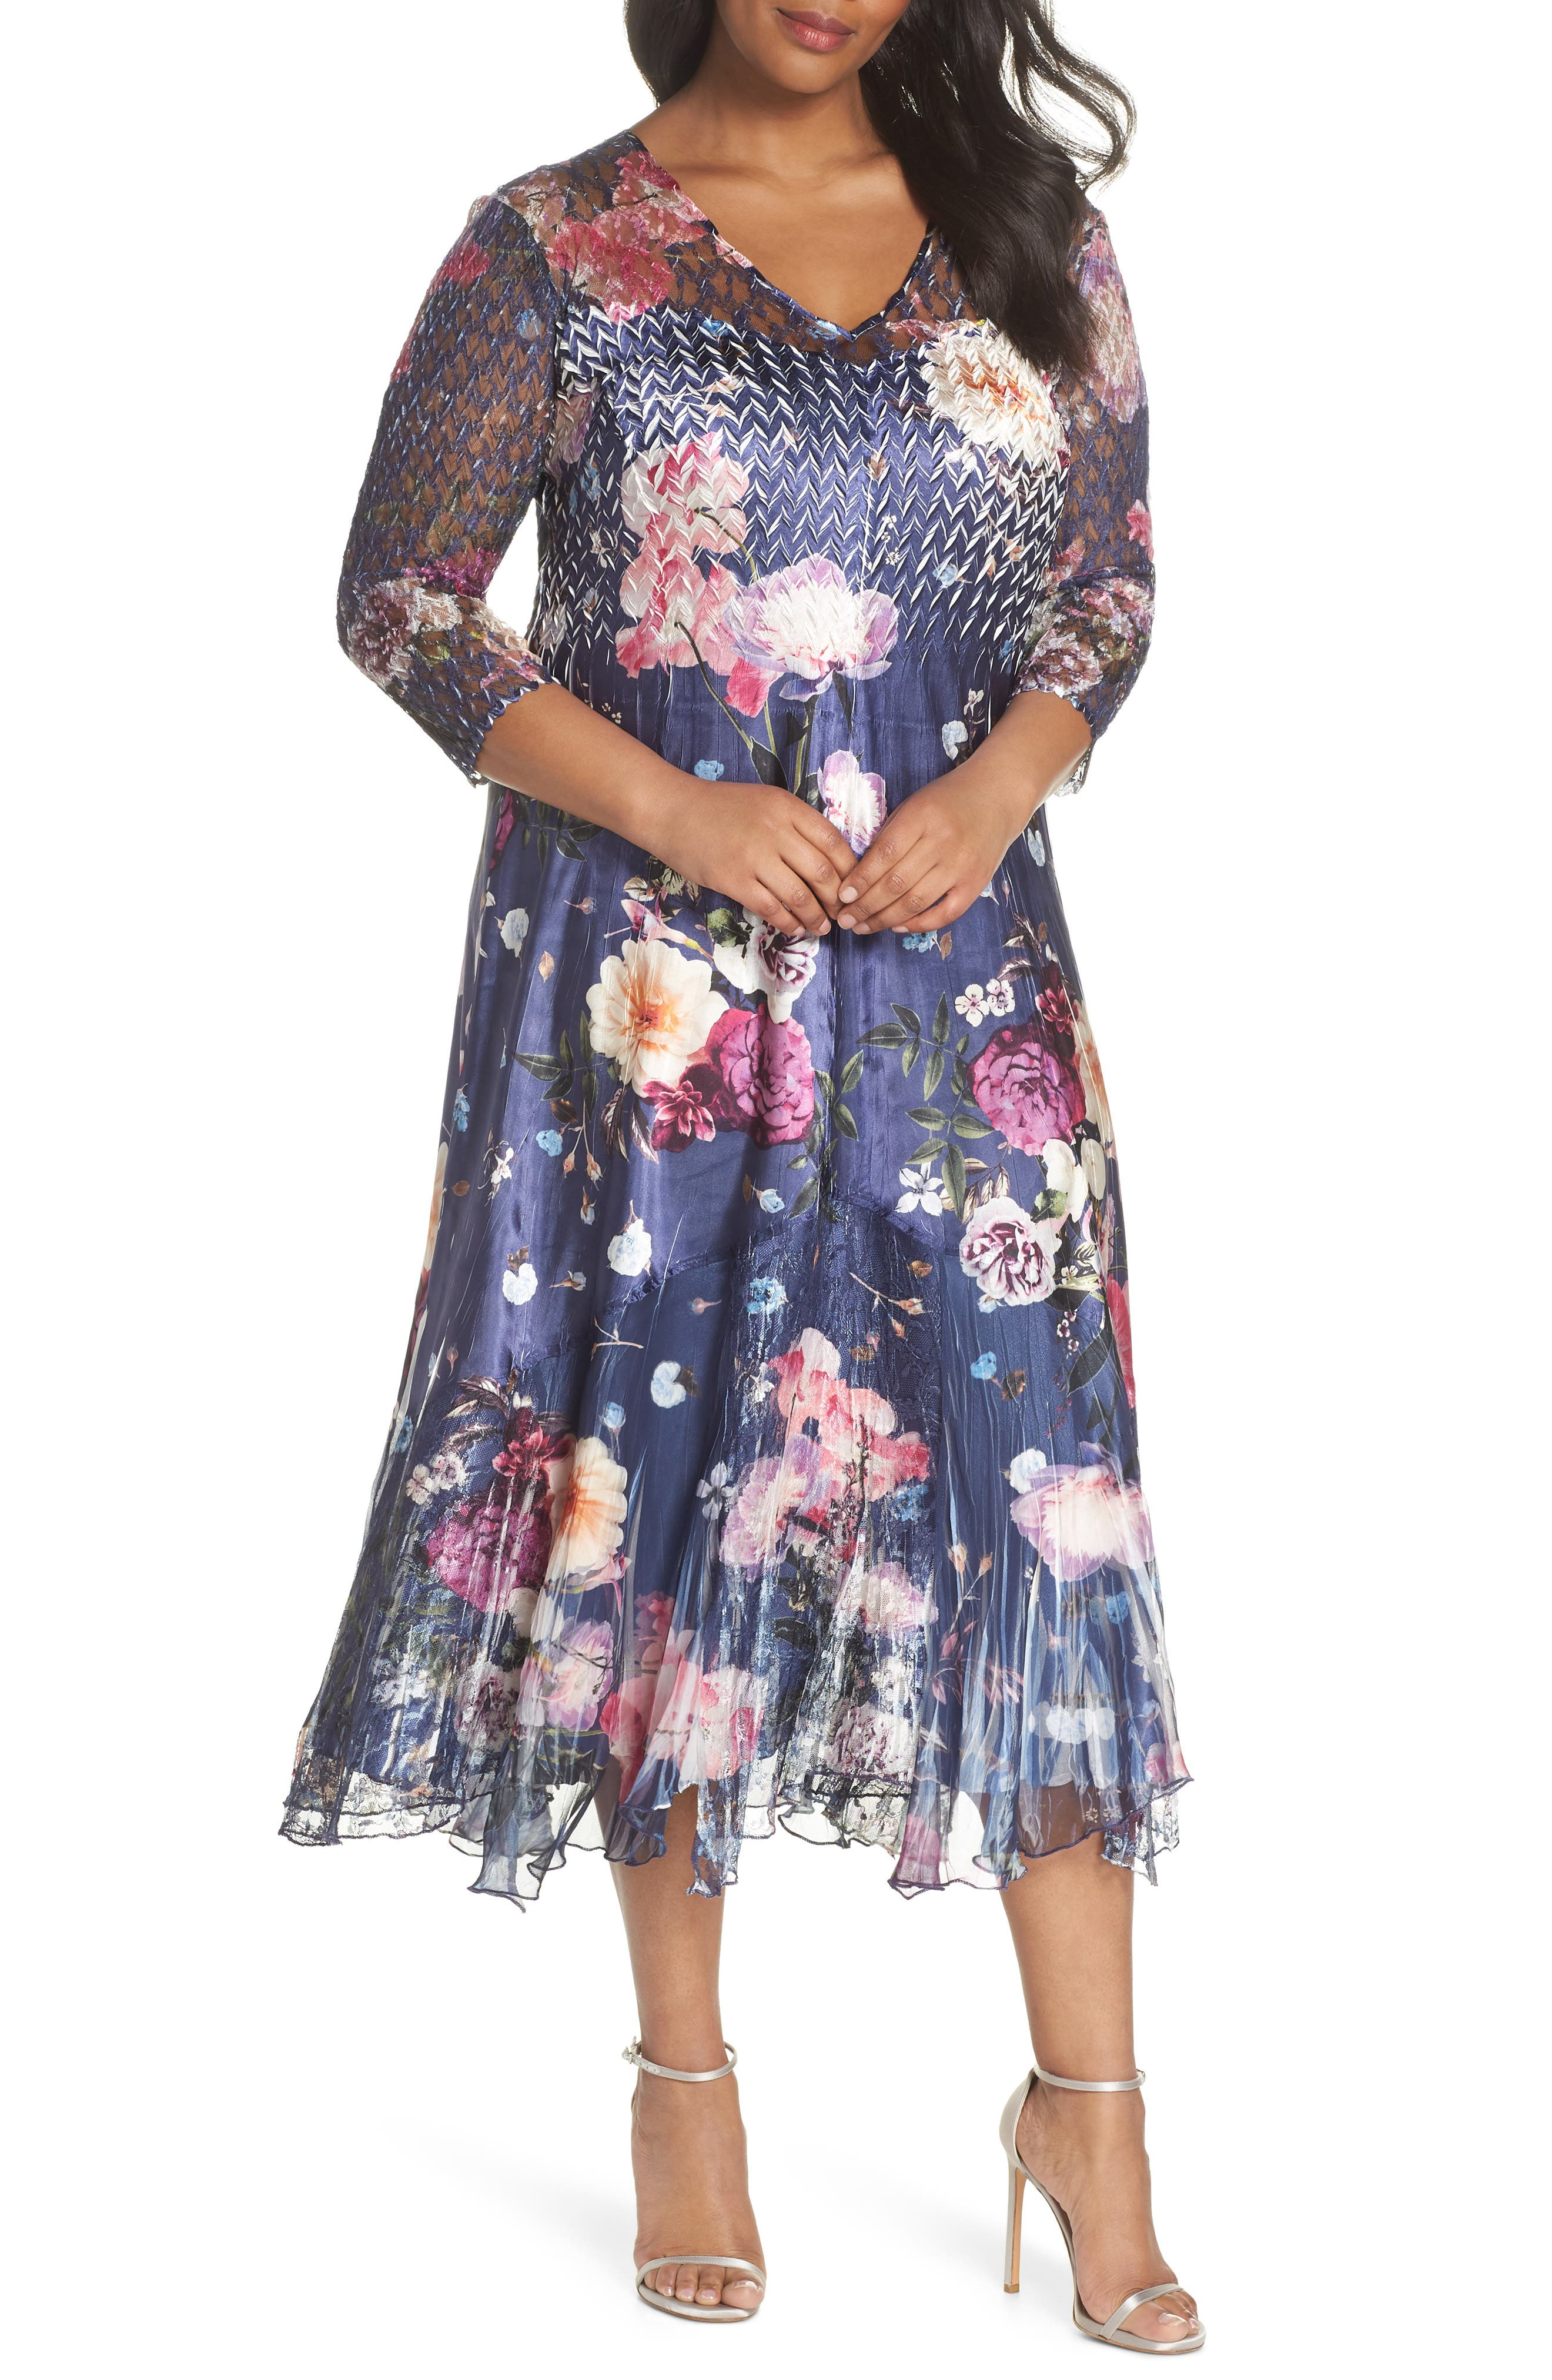 Main Image - Koramov Floral Print Lace Inset Dress (Plus Size)